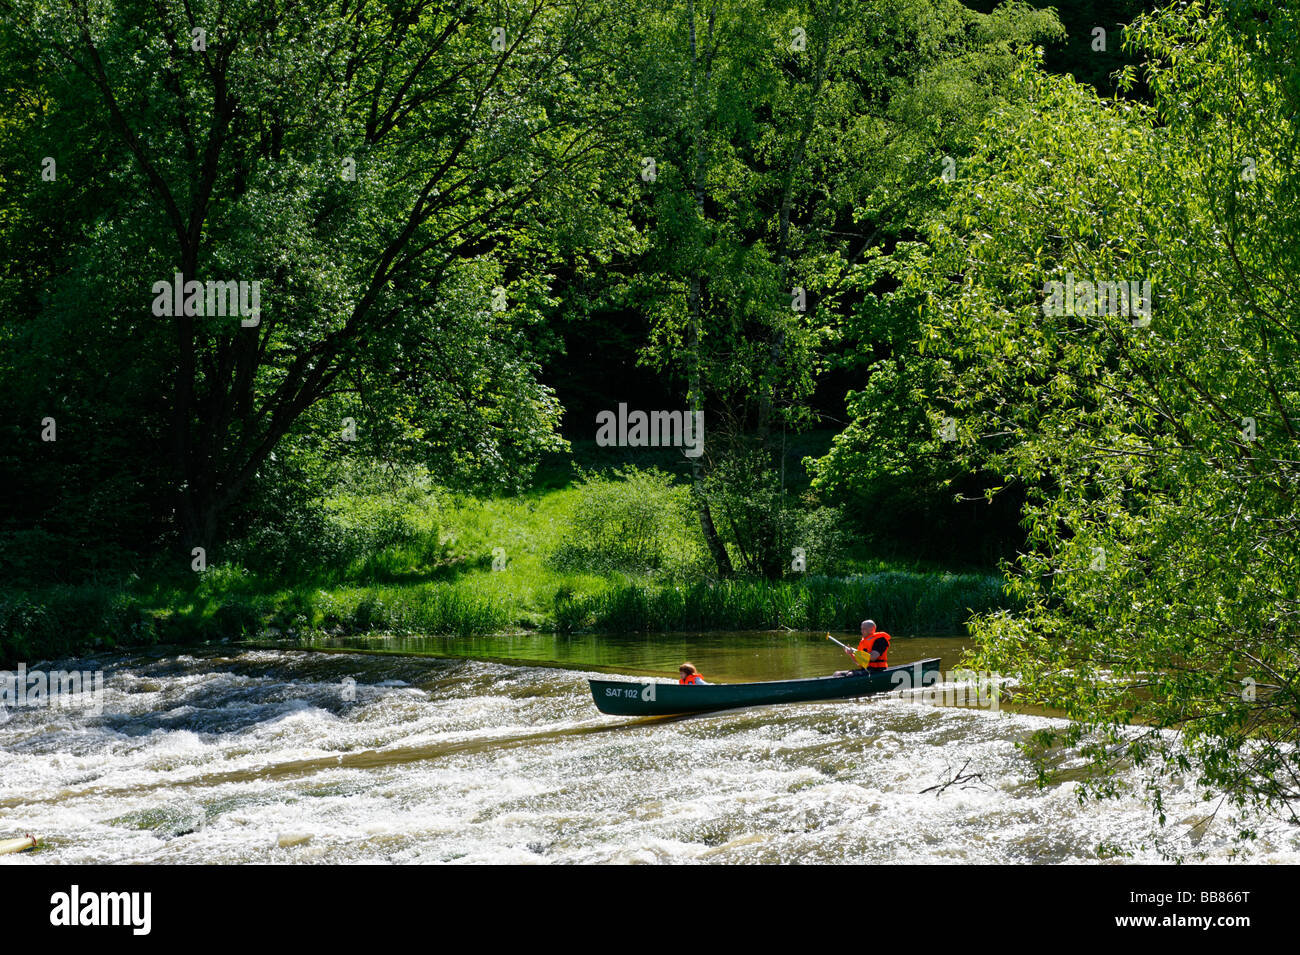 Tour de canoa, viaje en canoa, cerca del valle de Altmuehltal Dollnstein, Alta Baviera, Alemania, Europa Foto de stock